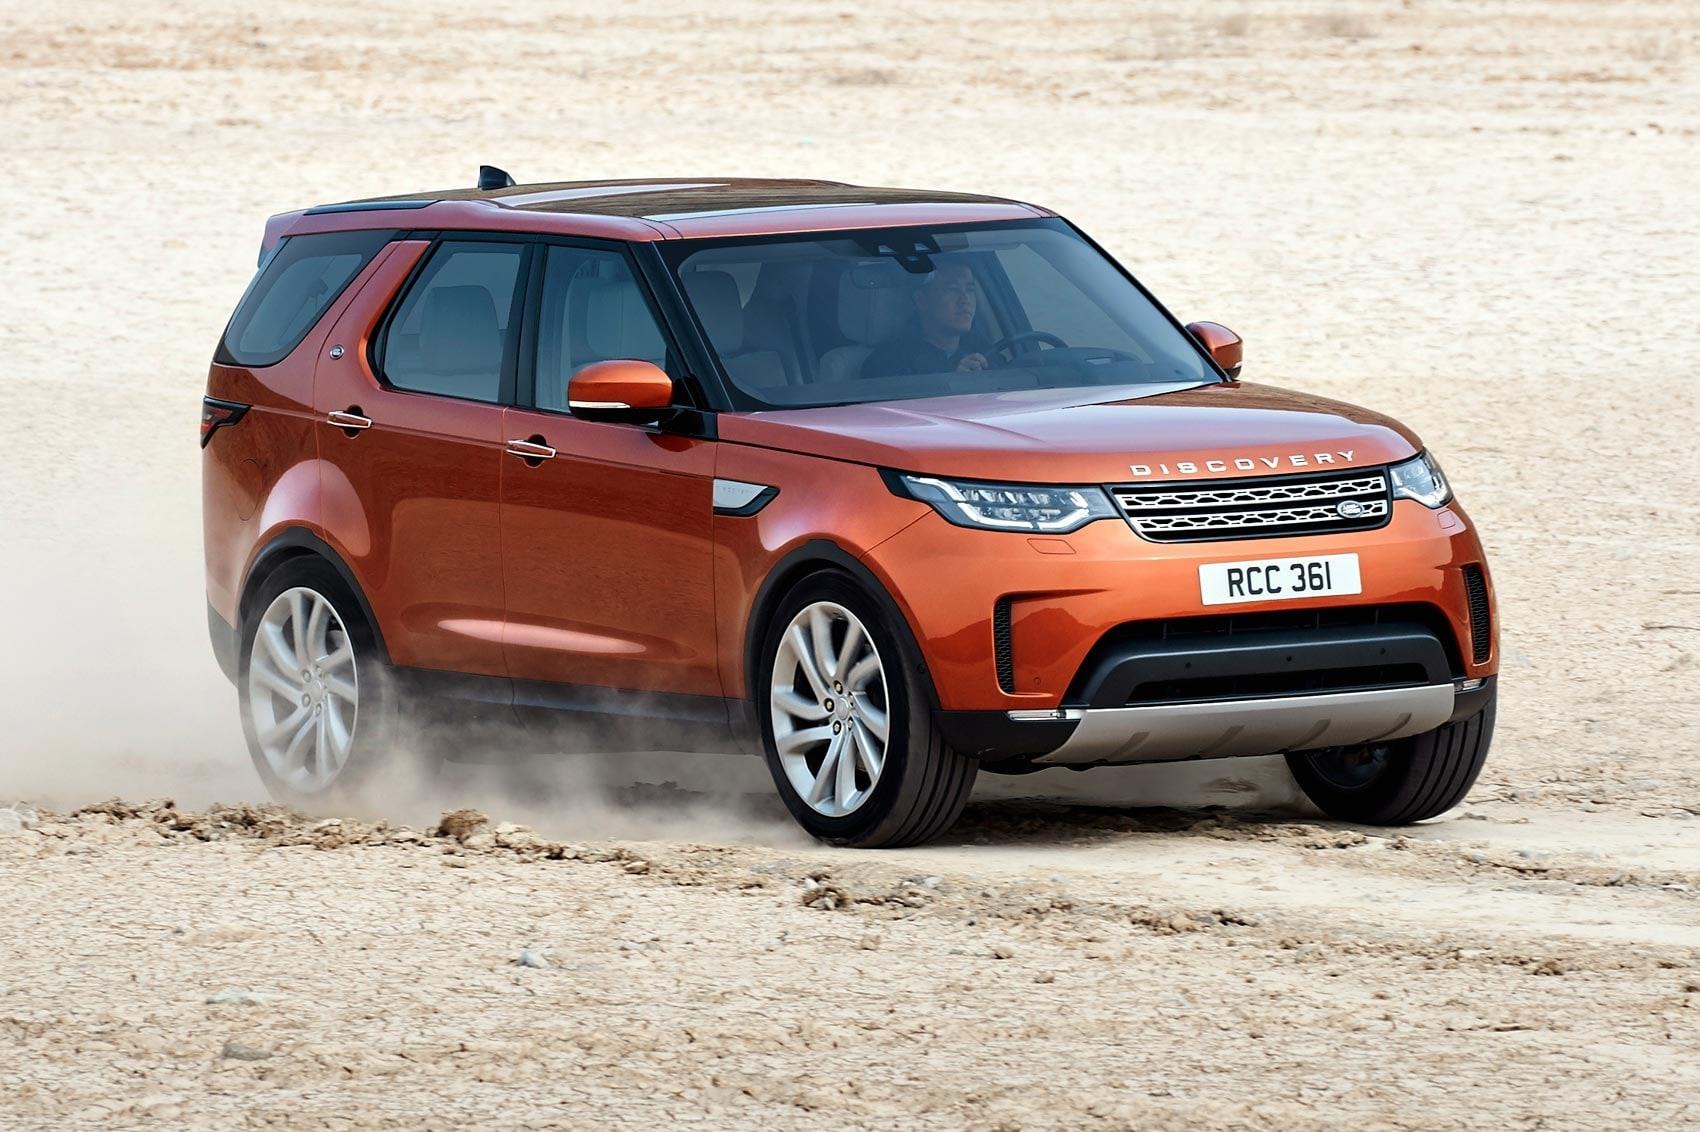 Land Rover Discovery 5 Desktop wallpaper